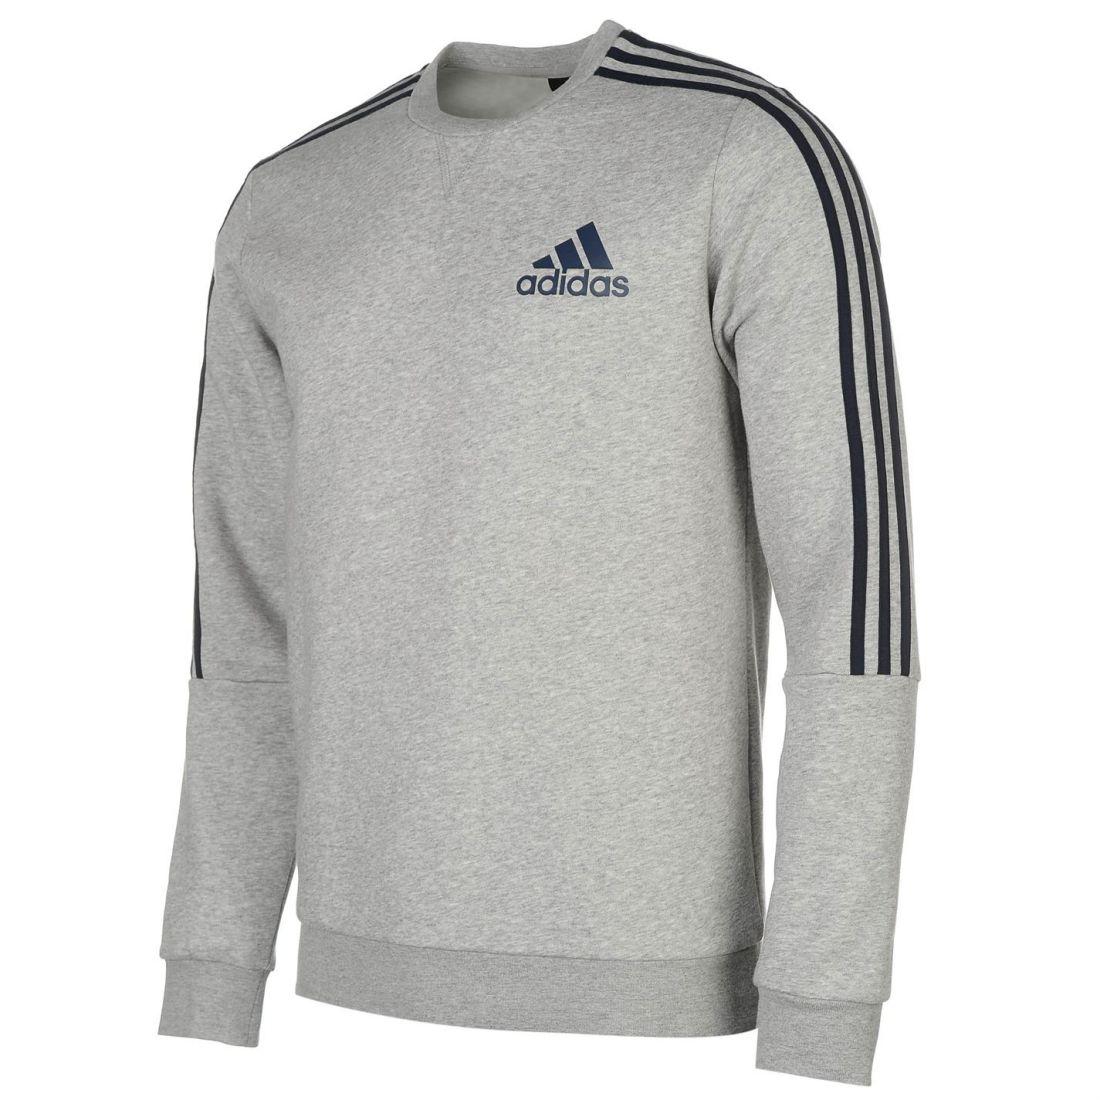 1edca32611e2 adidas Mens Gents 3 Stripe Sweatshirt Jumper Crew Neck Long Sleeve ...